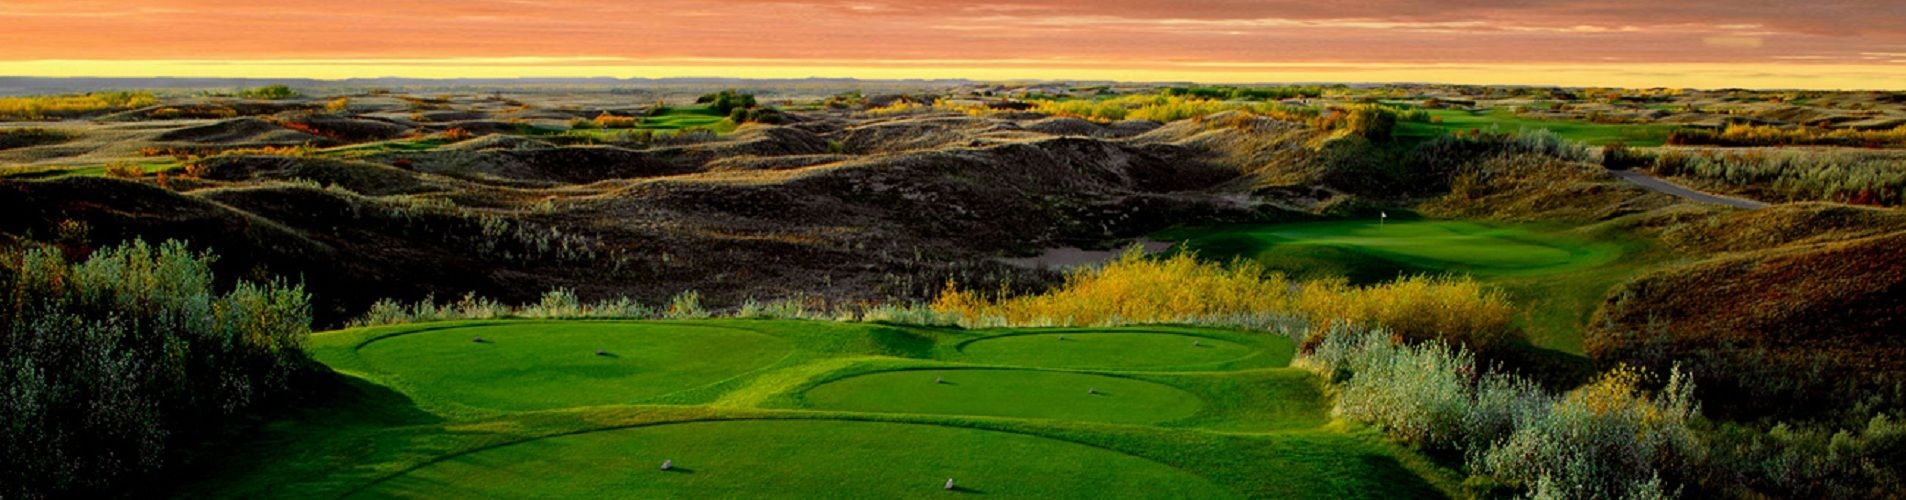 Dakota dunes golf links cover picture